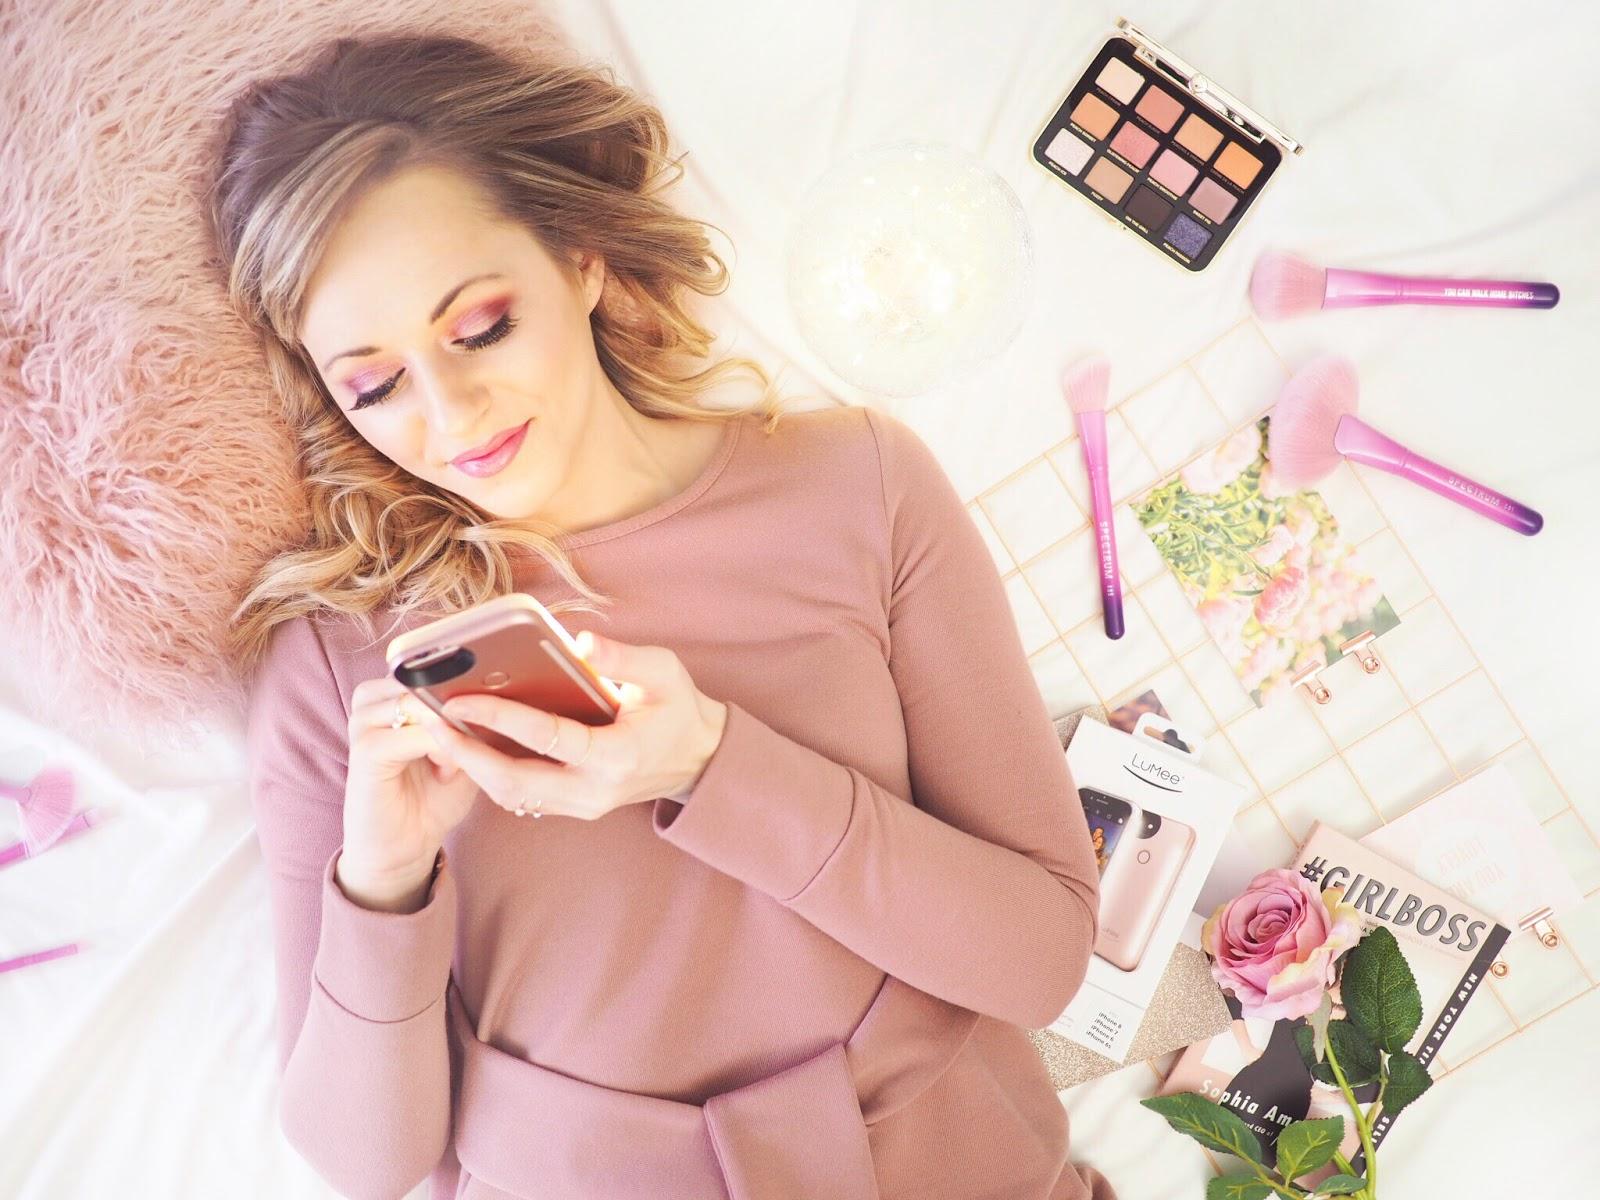 selfie tips, LuMee, light up phone case